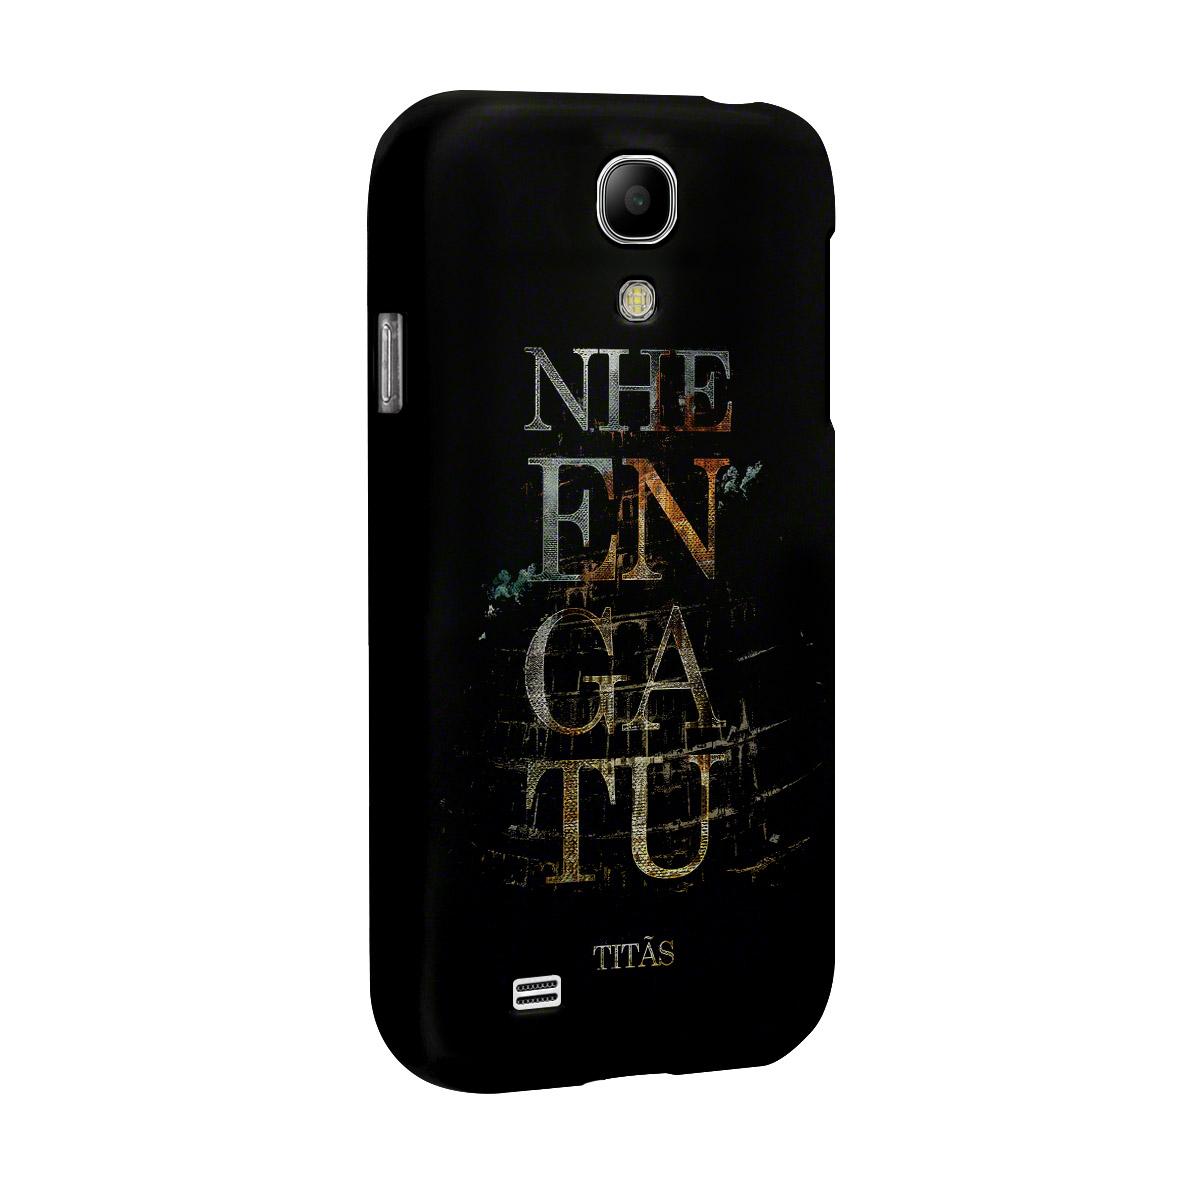 Capa de Celular Samsung Galaxy S4 Tit�s Nheengatu